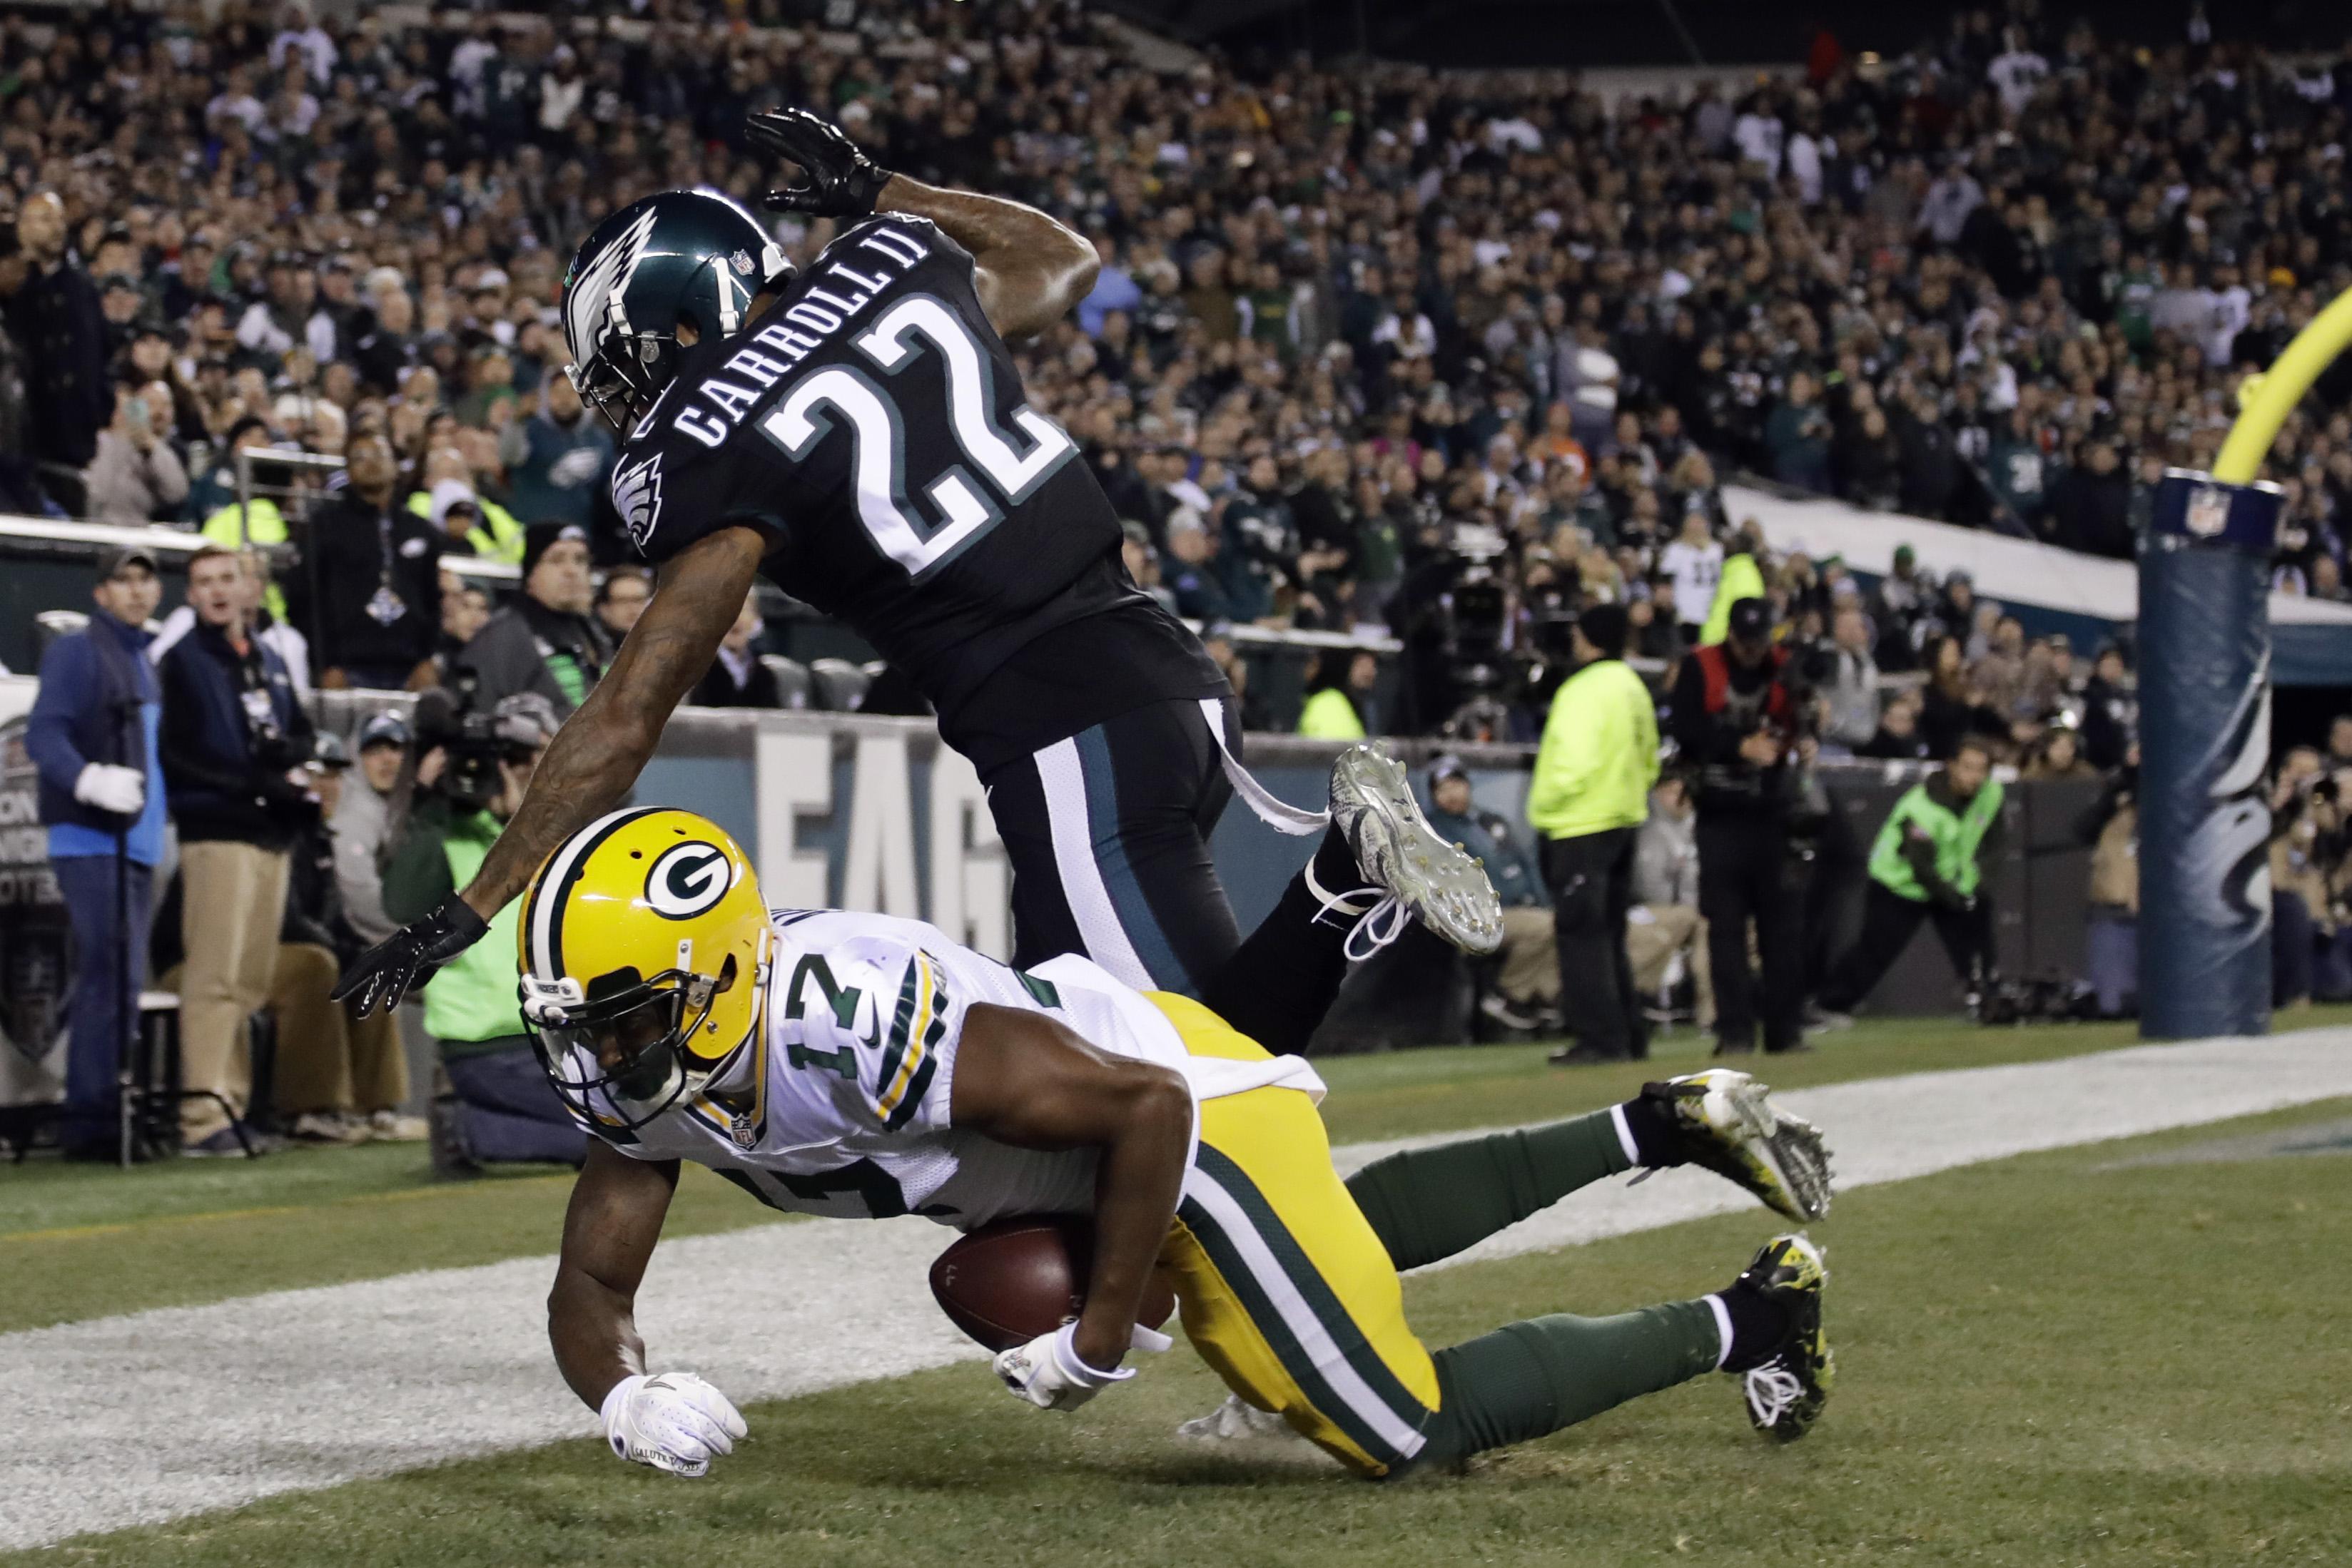 Green Bay Packers' Trevor Davis (11) scores a touchdown against Philadelphia Eagles' Nolan Carroll (22) during the first half of an NFL football game, Monday, Nov. 28, 2016, in Philadelphia. (AP Photo/Matt Rourke)